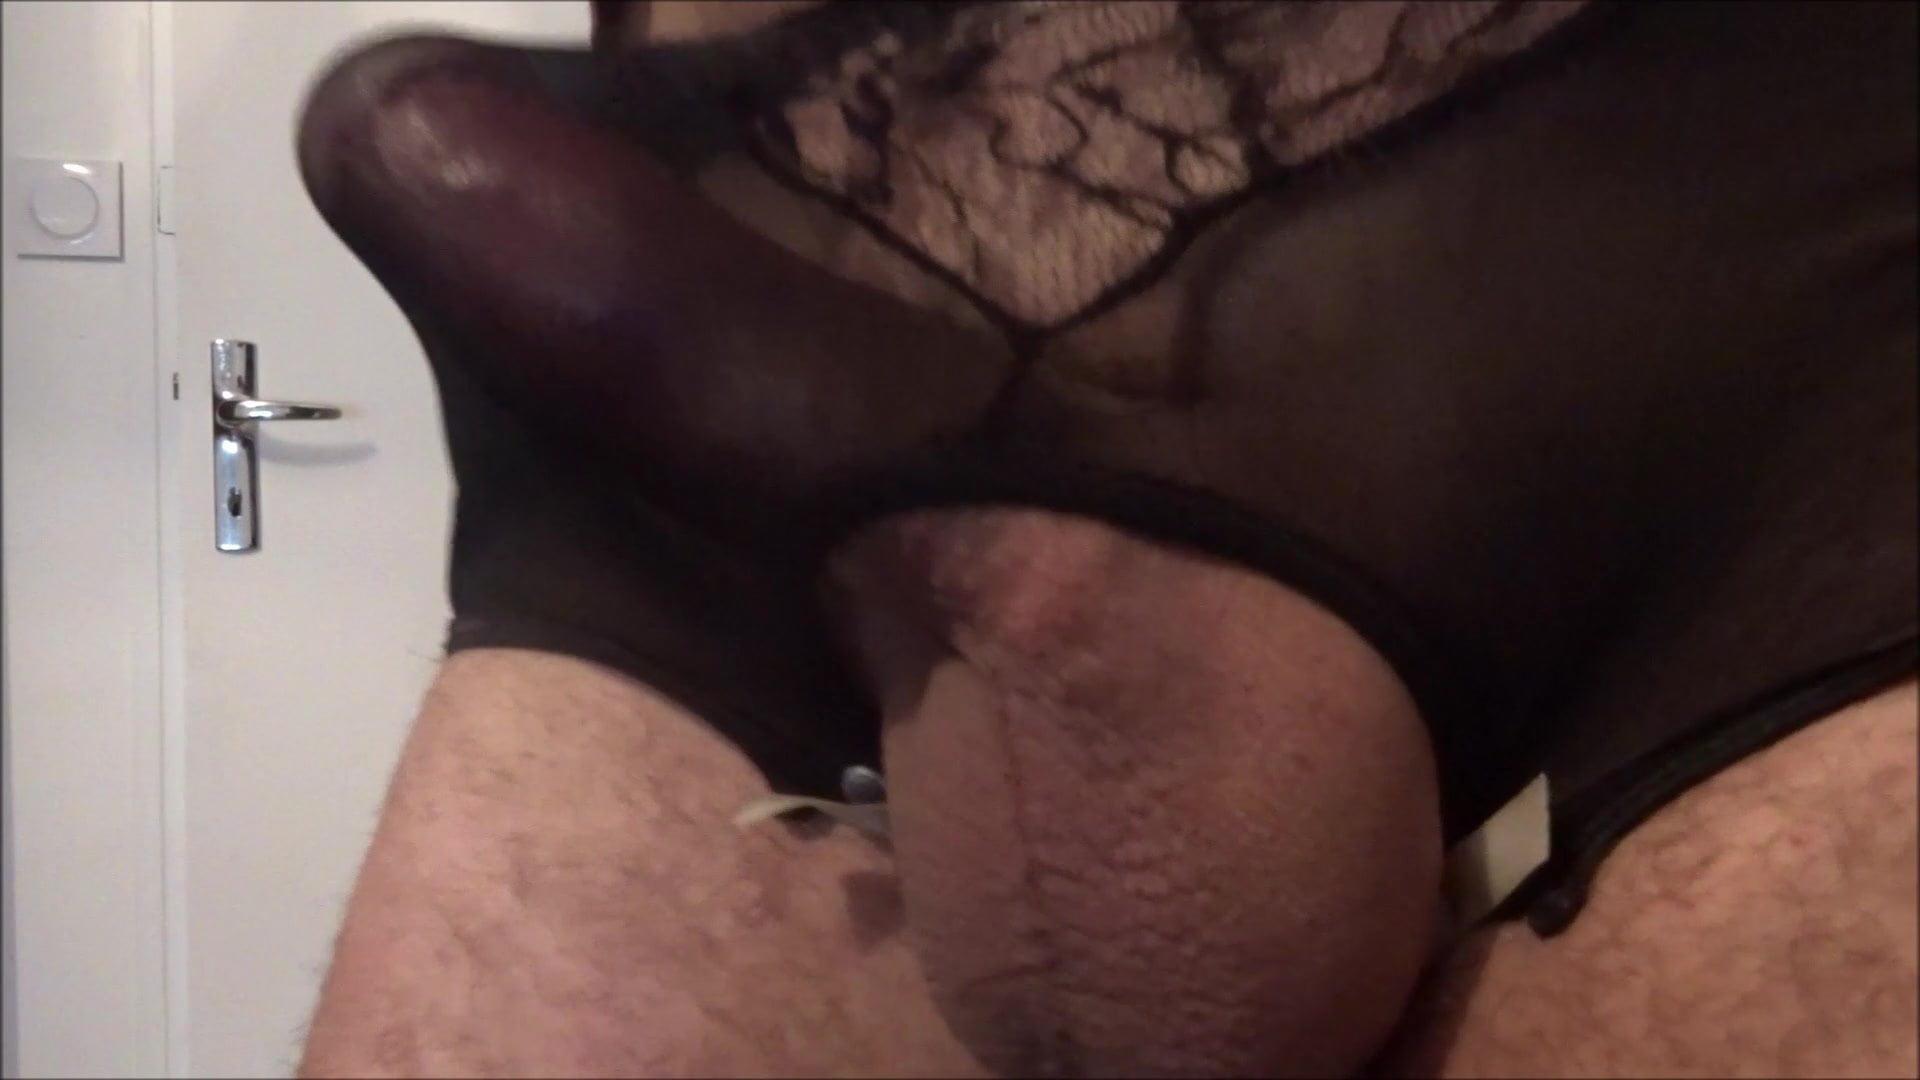 Cocks in underwear